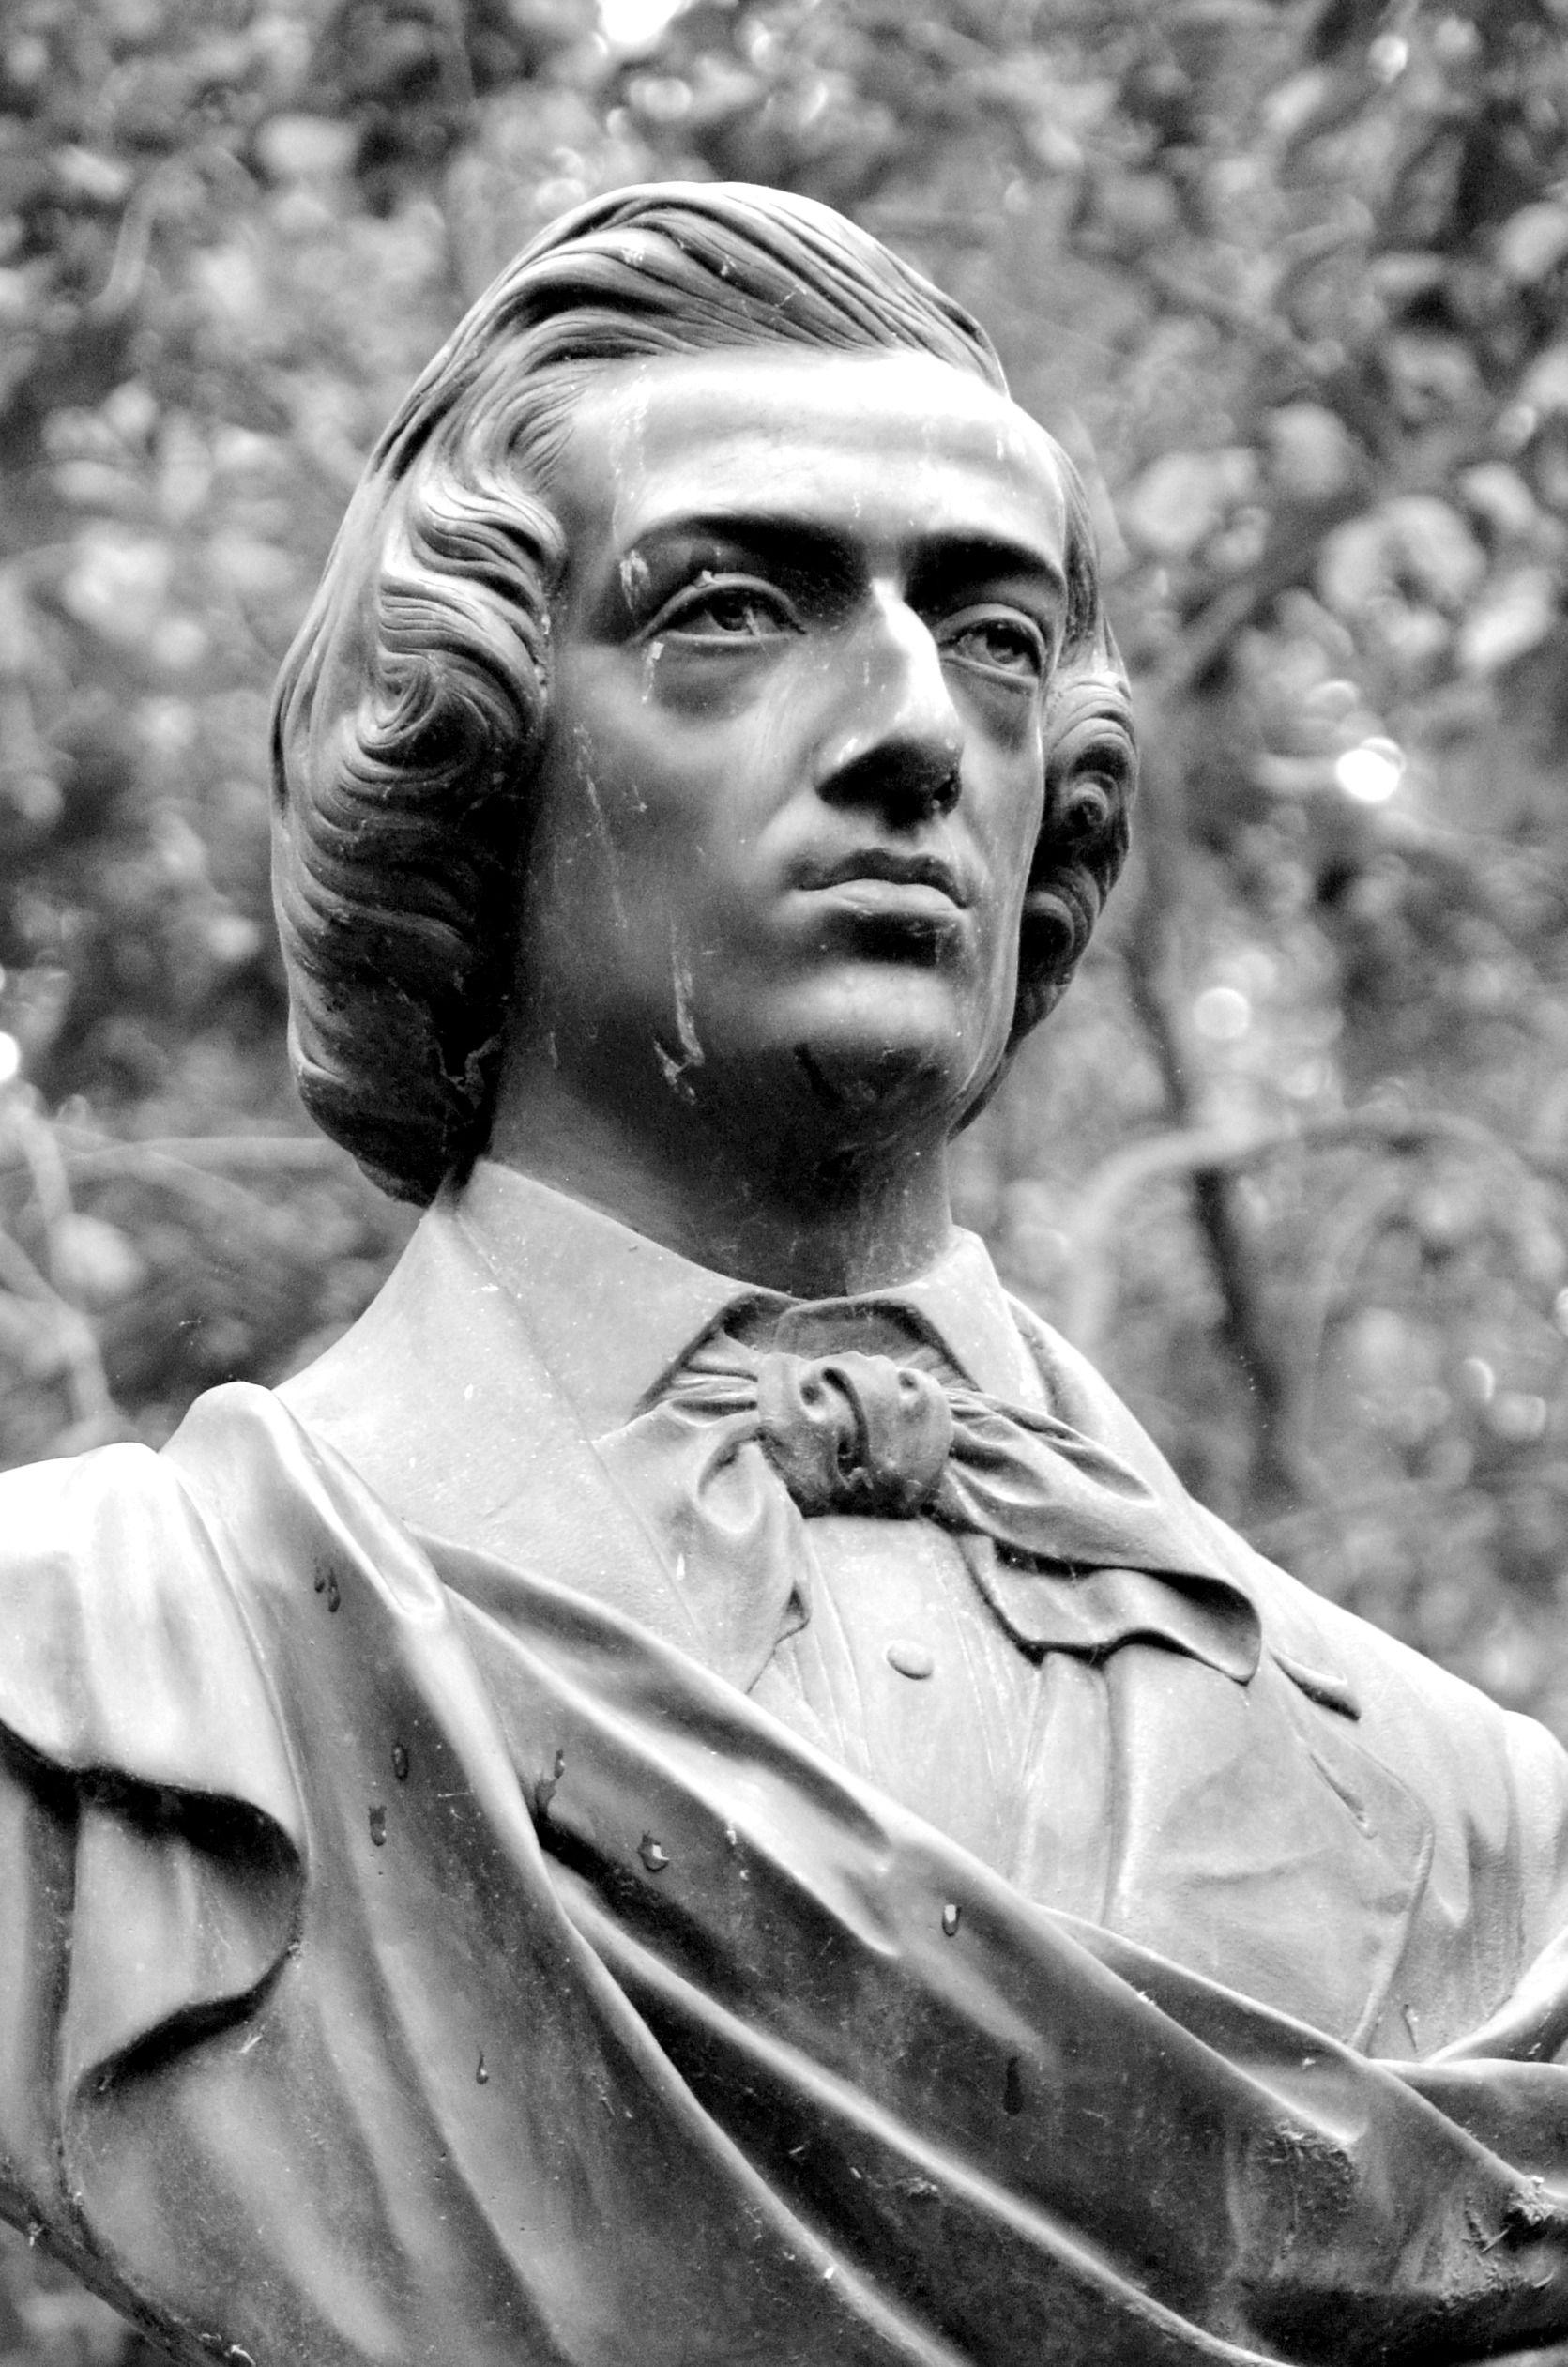 6368be4ffe7d4af0a8d5b3971c809510 - The Monument To Chopin In The Luxembourg Gardens